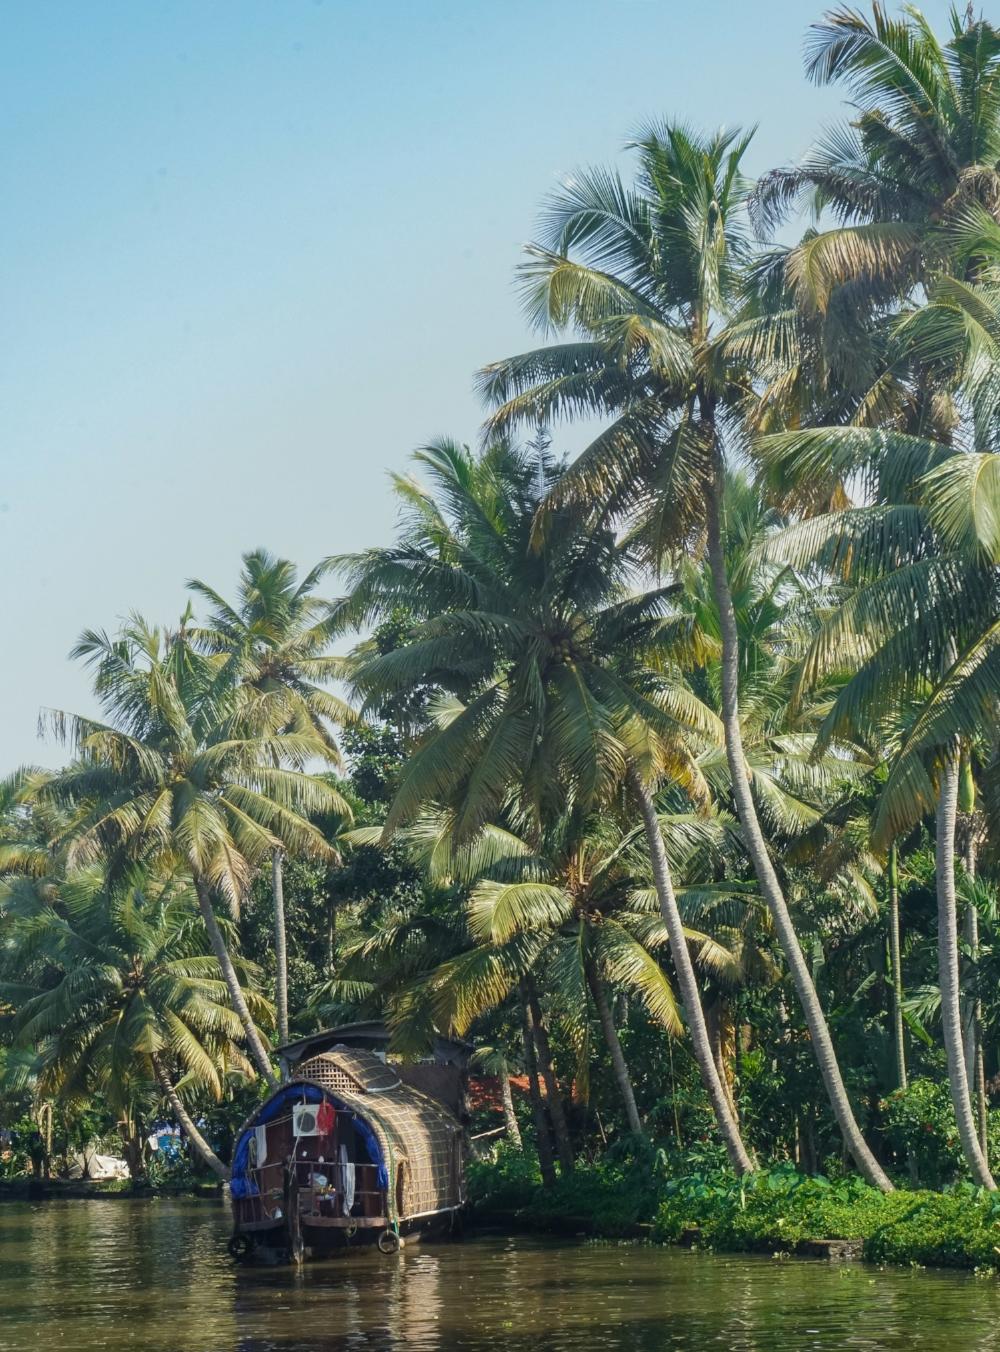 curio.trips.india.kerala.backwaters.houseboat-2.jpg